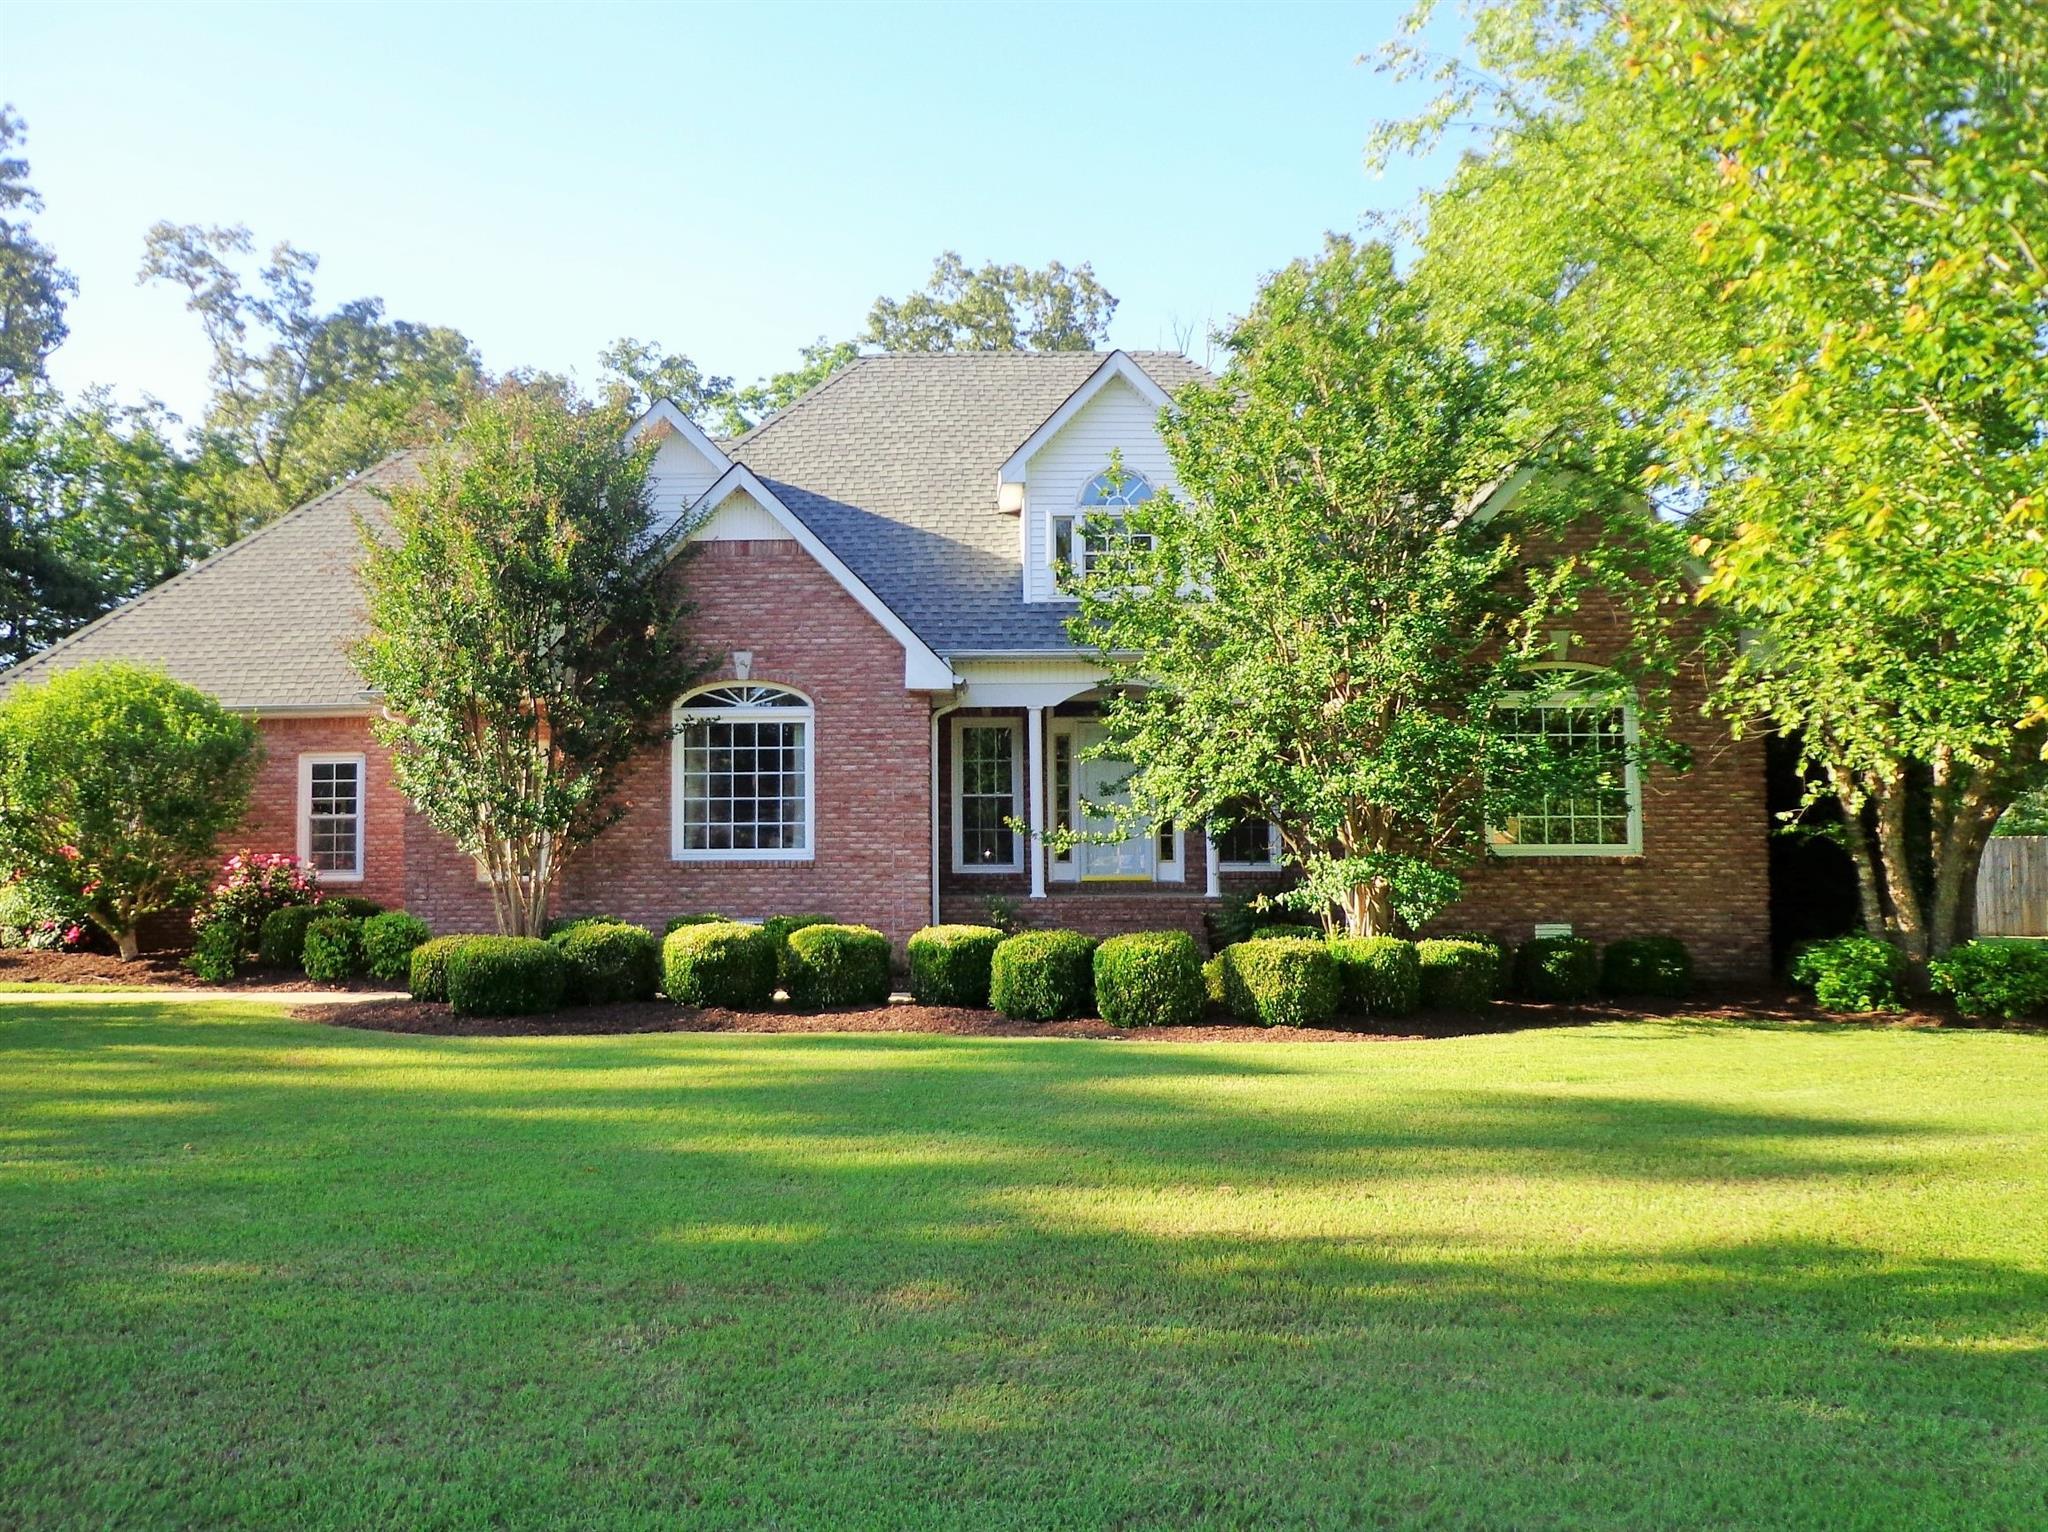 511 Callahan Dr, New Johnsonville, TN 37134